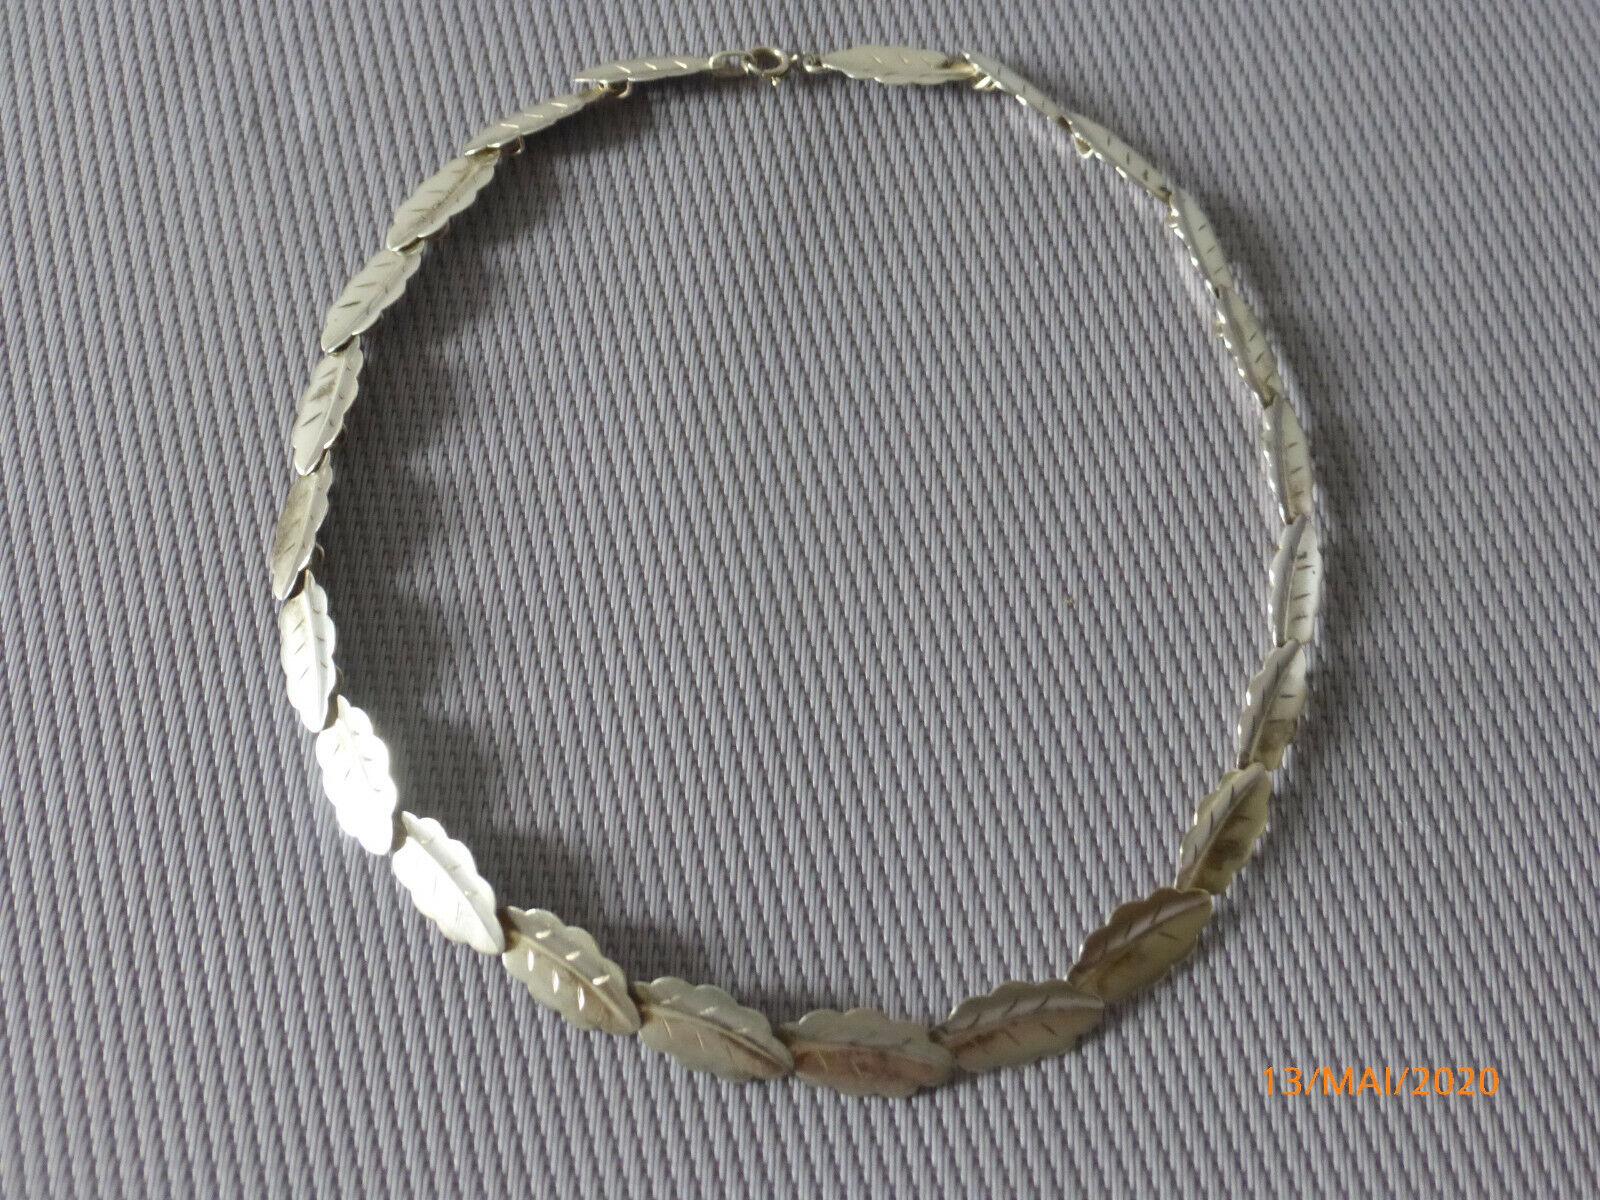 835 Silber TEKA Halskette Blatt , Blätter Halsschmuck, Kette, Collier